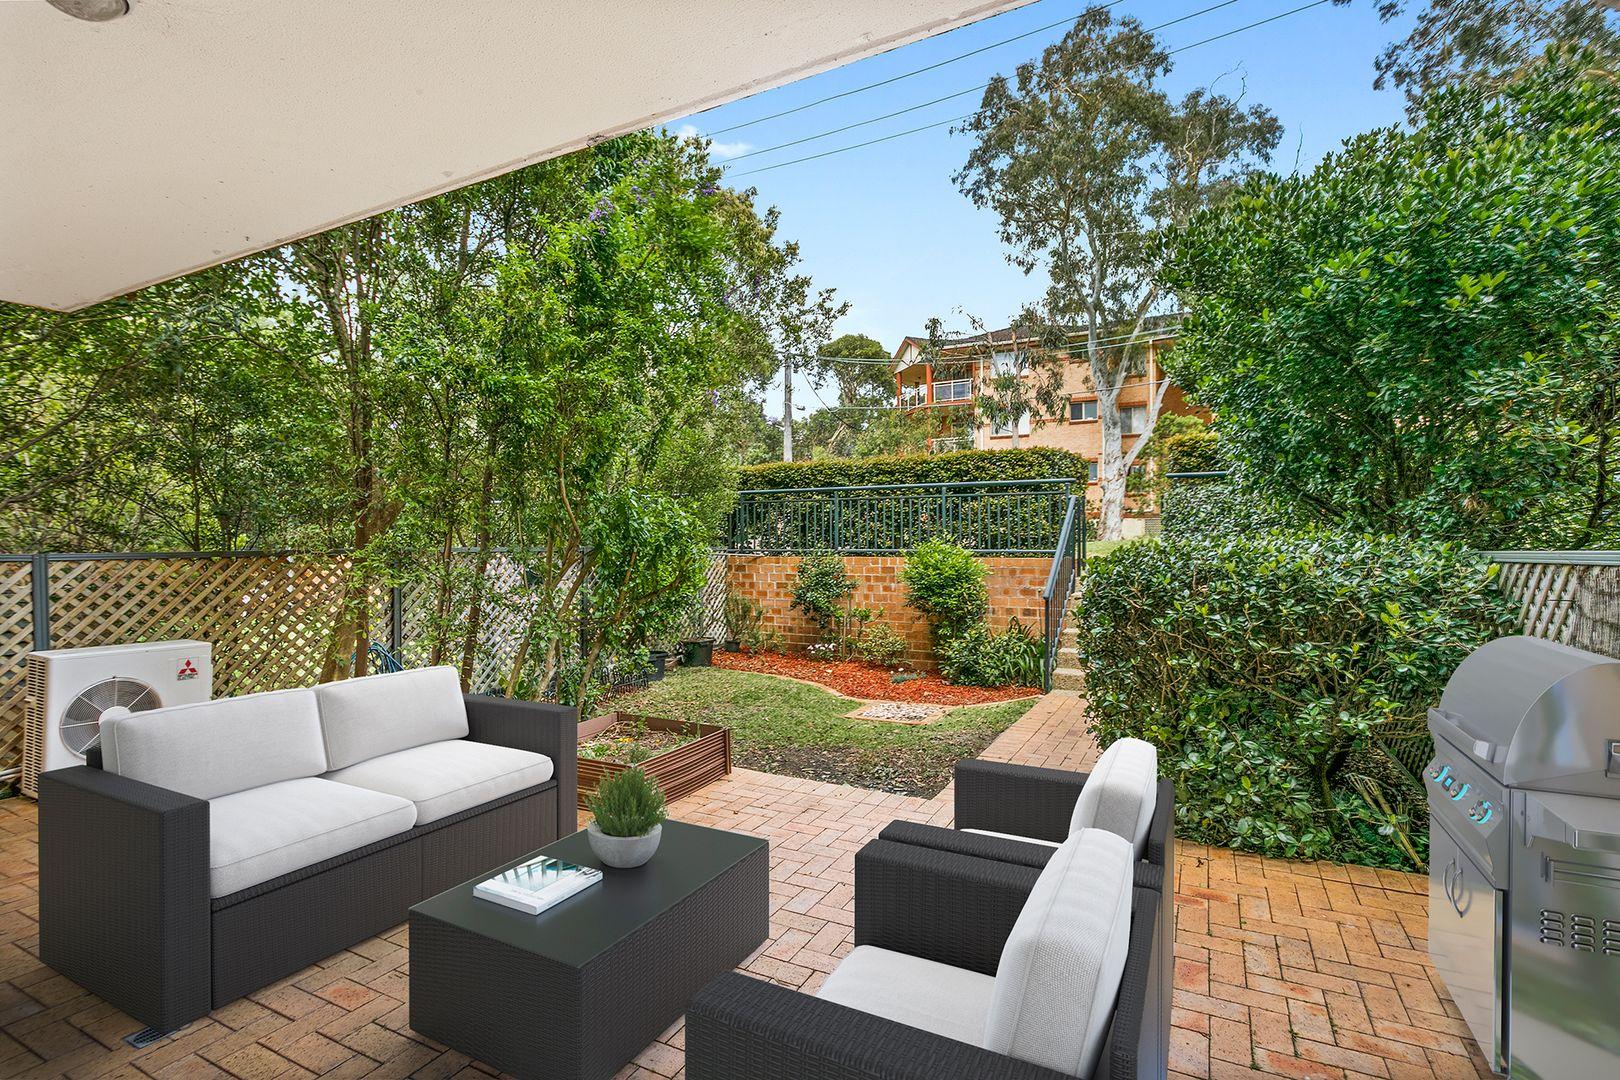 14/58 Belmont Street, Sutherland NSW 2232, Image 1